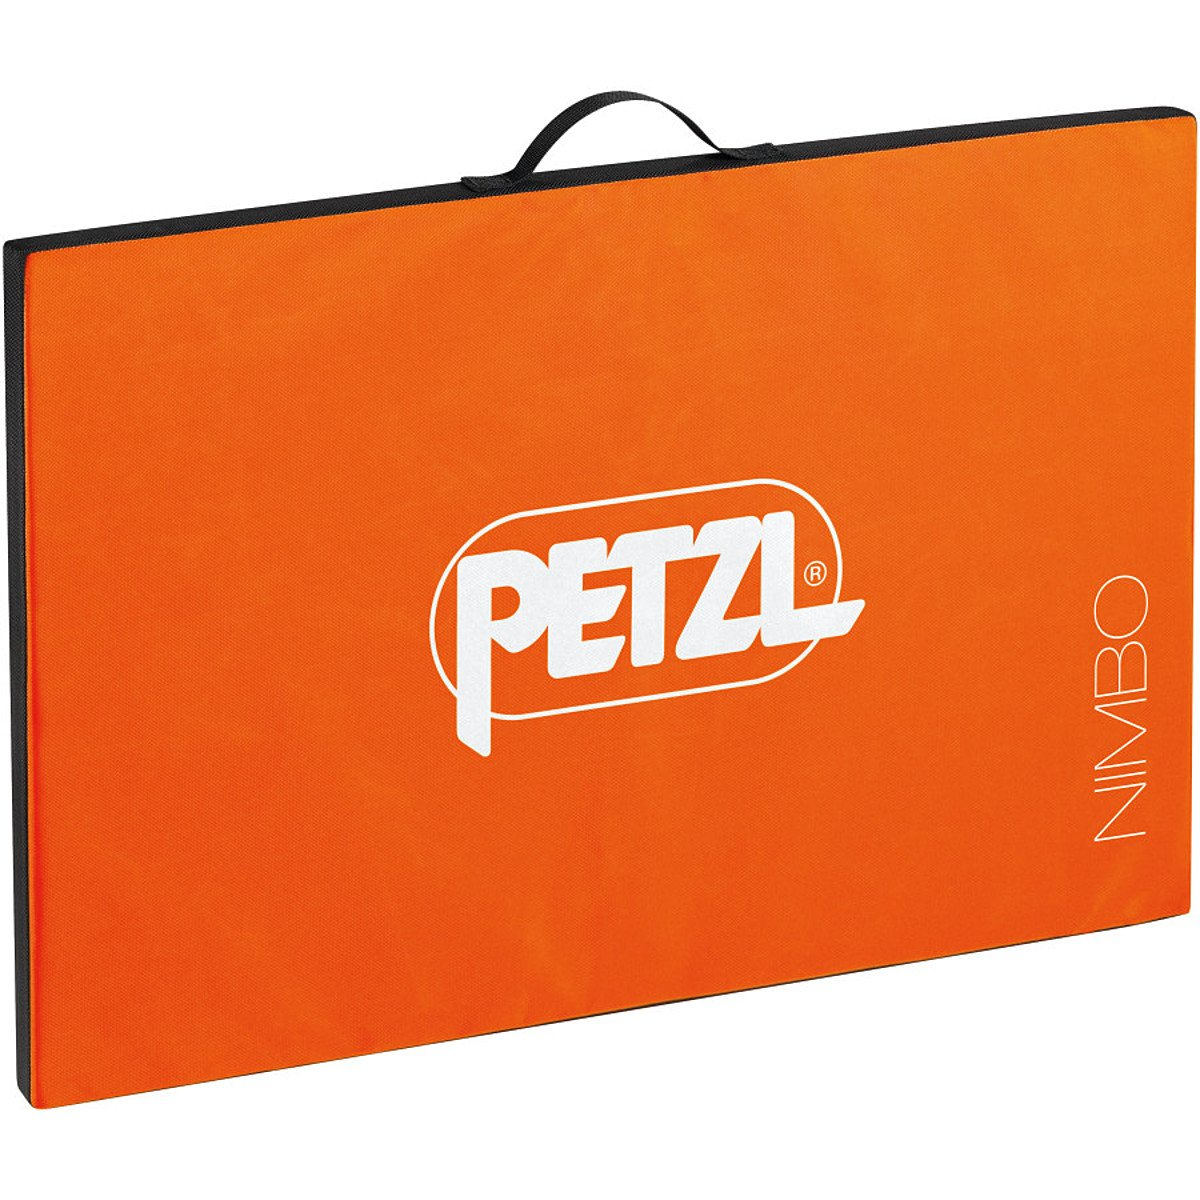 Petzl Crashpad Farbe Orange